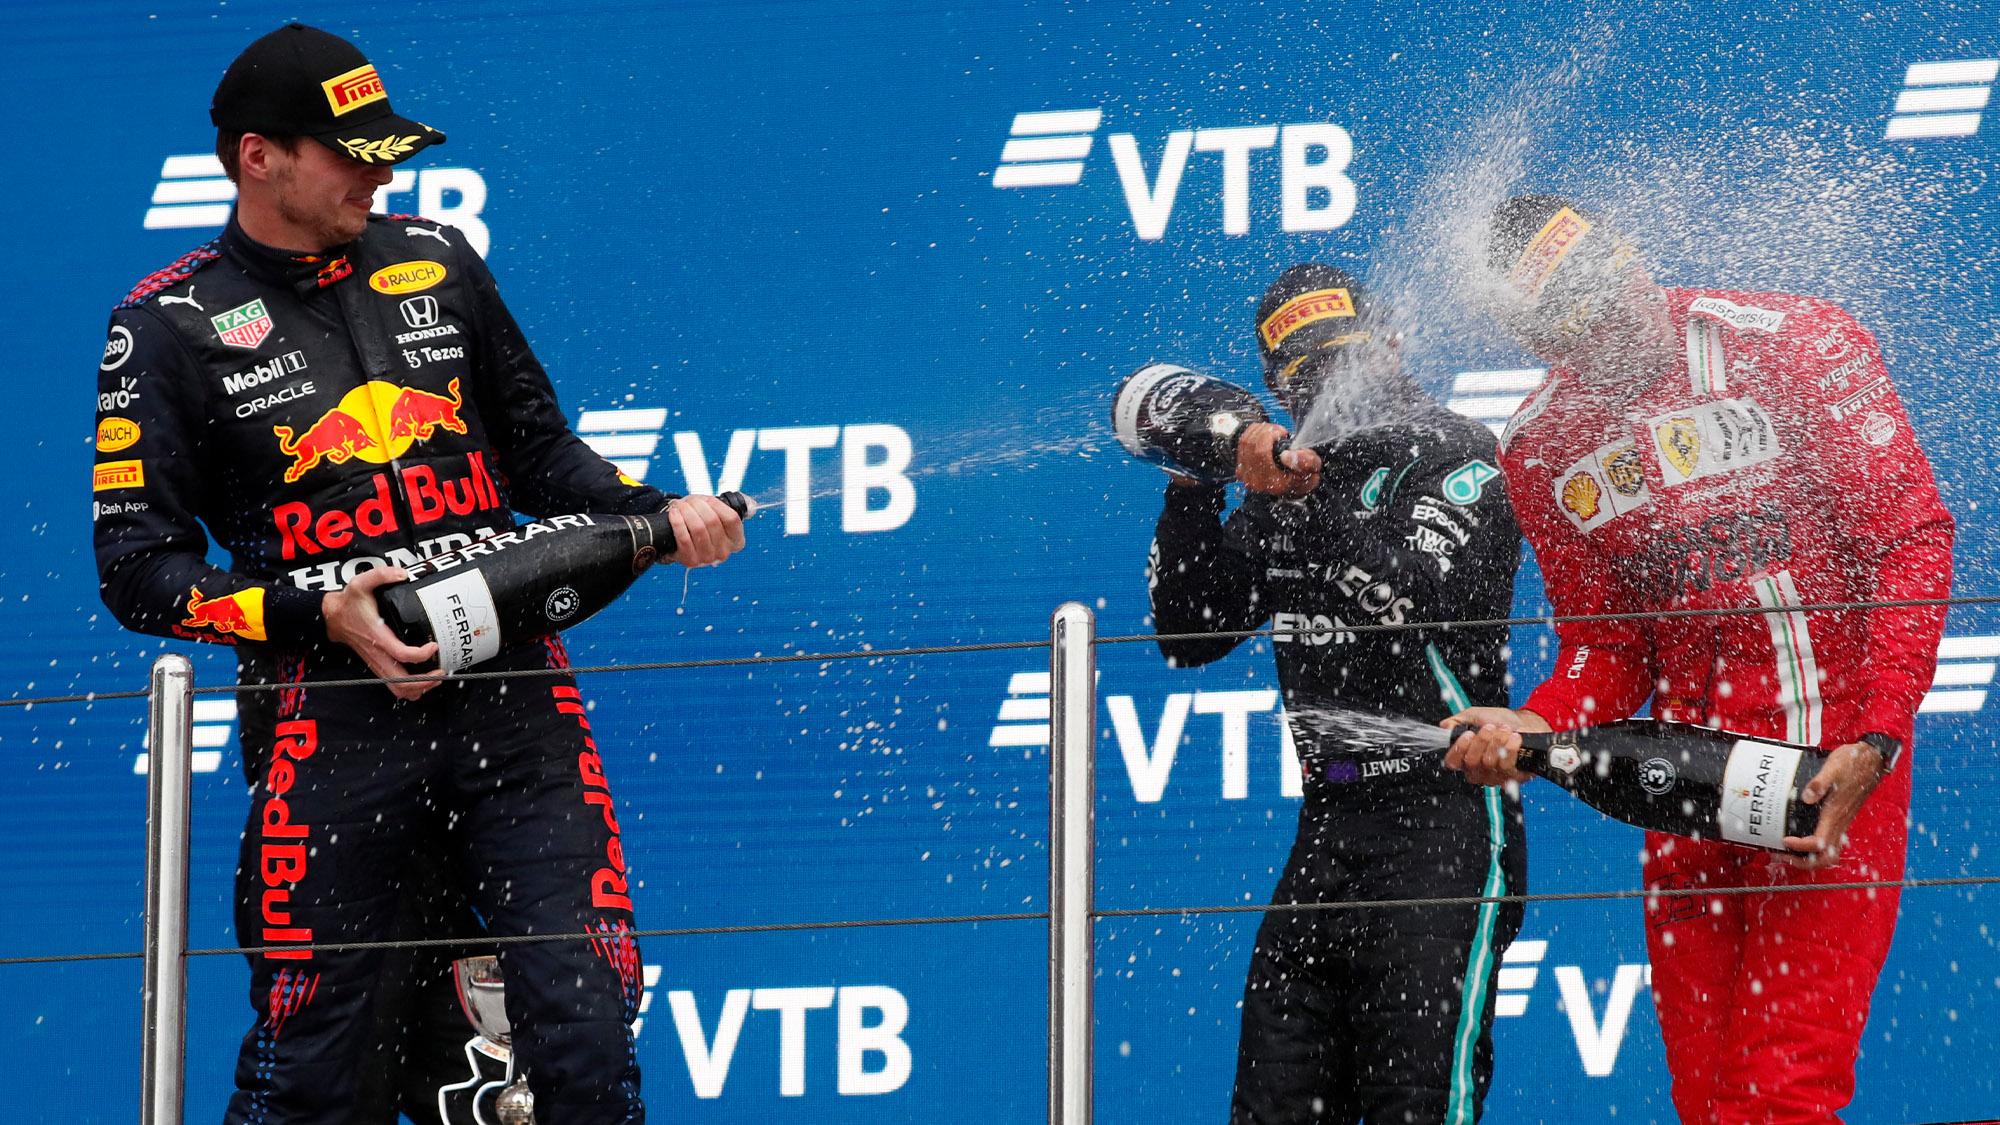 2021 Russian GP podium